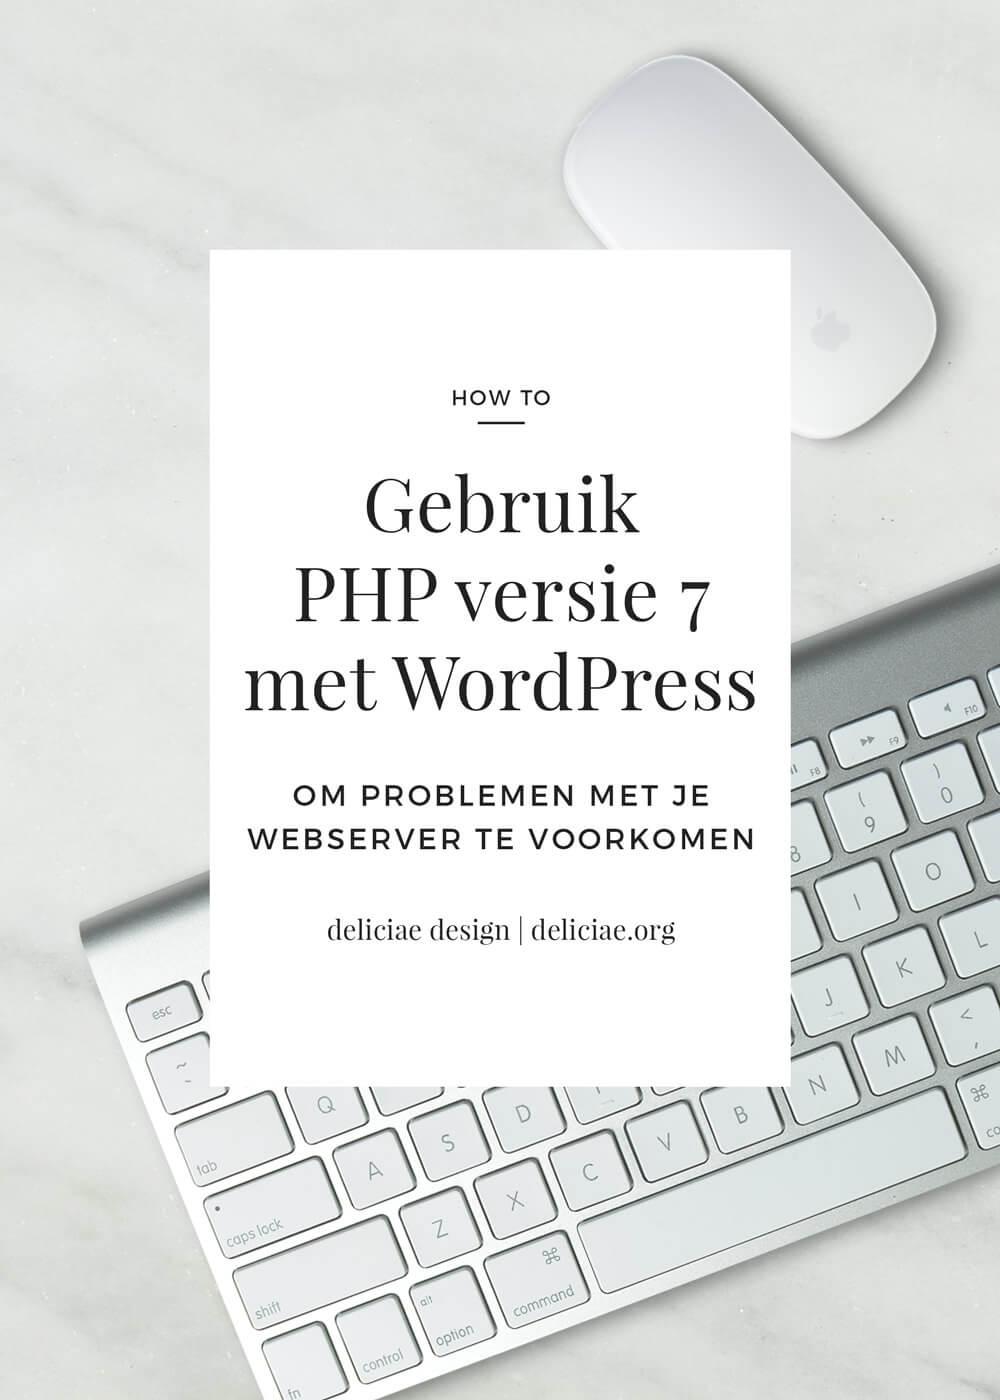 phpversie7wordpress